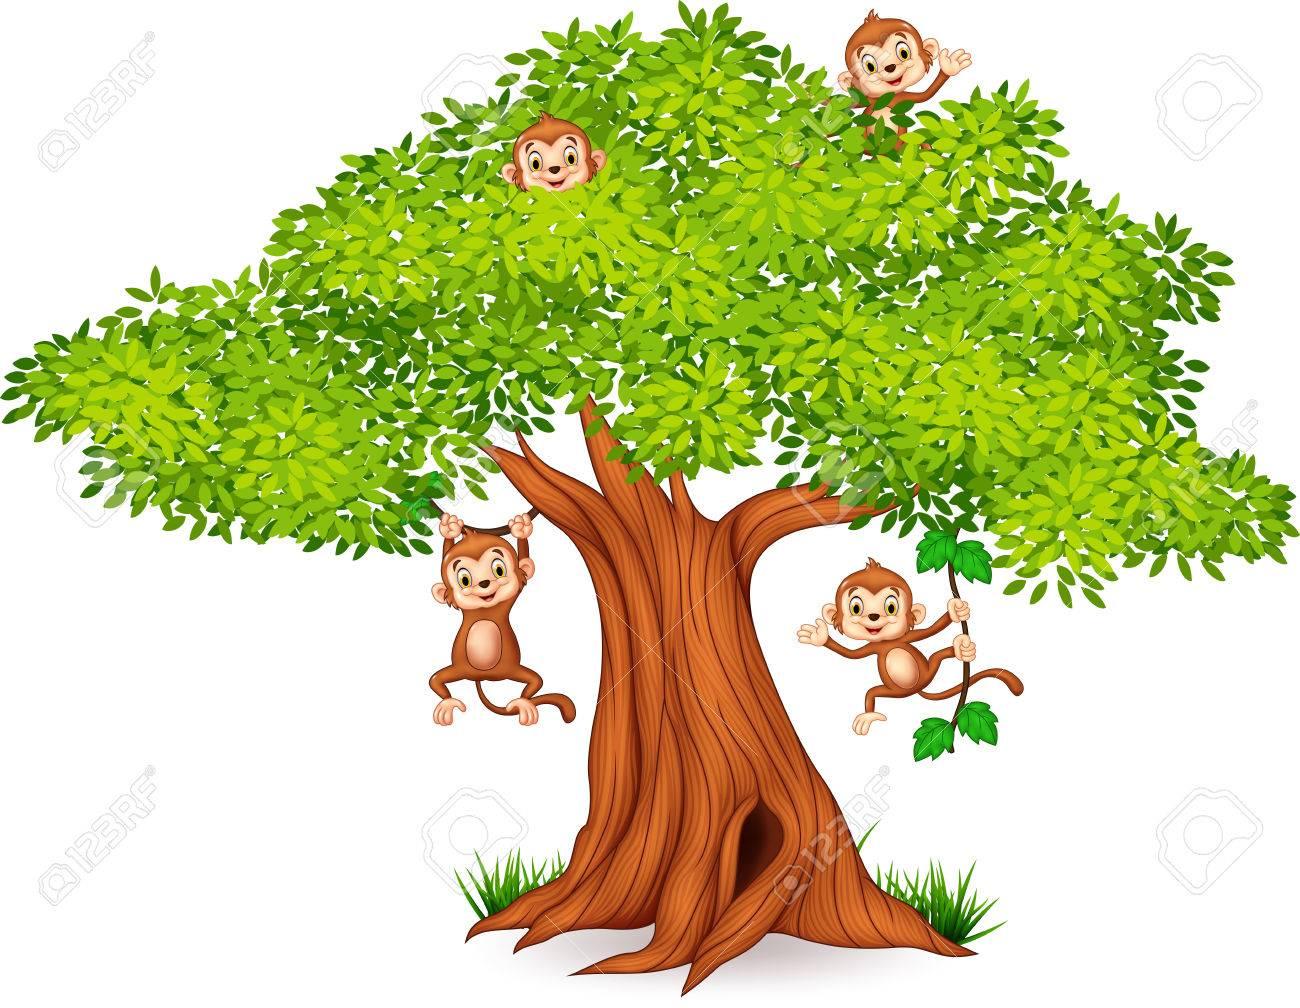 Vector illustration of Happy little monkey hanging on tree.